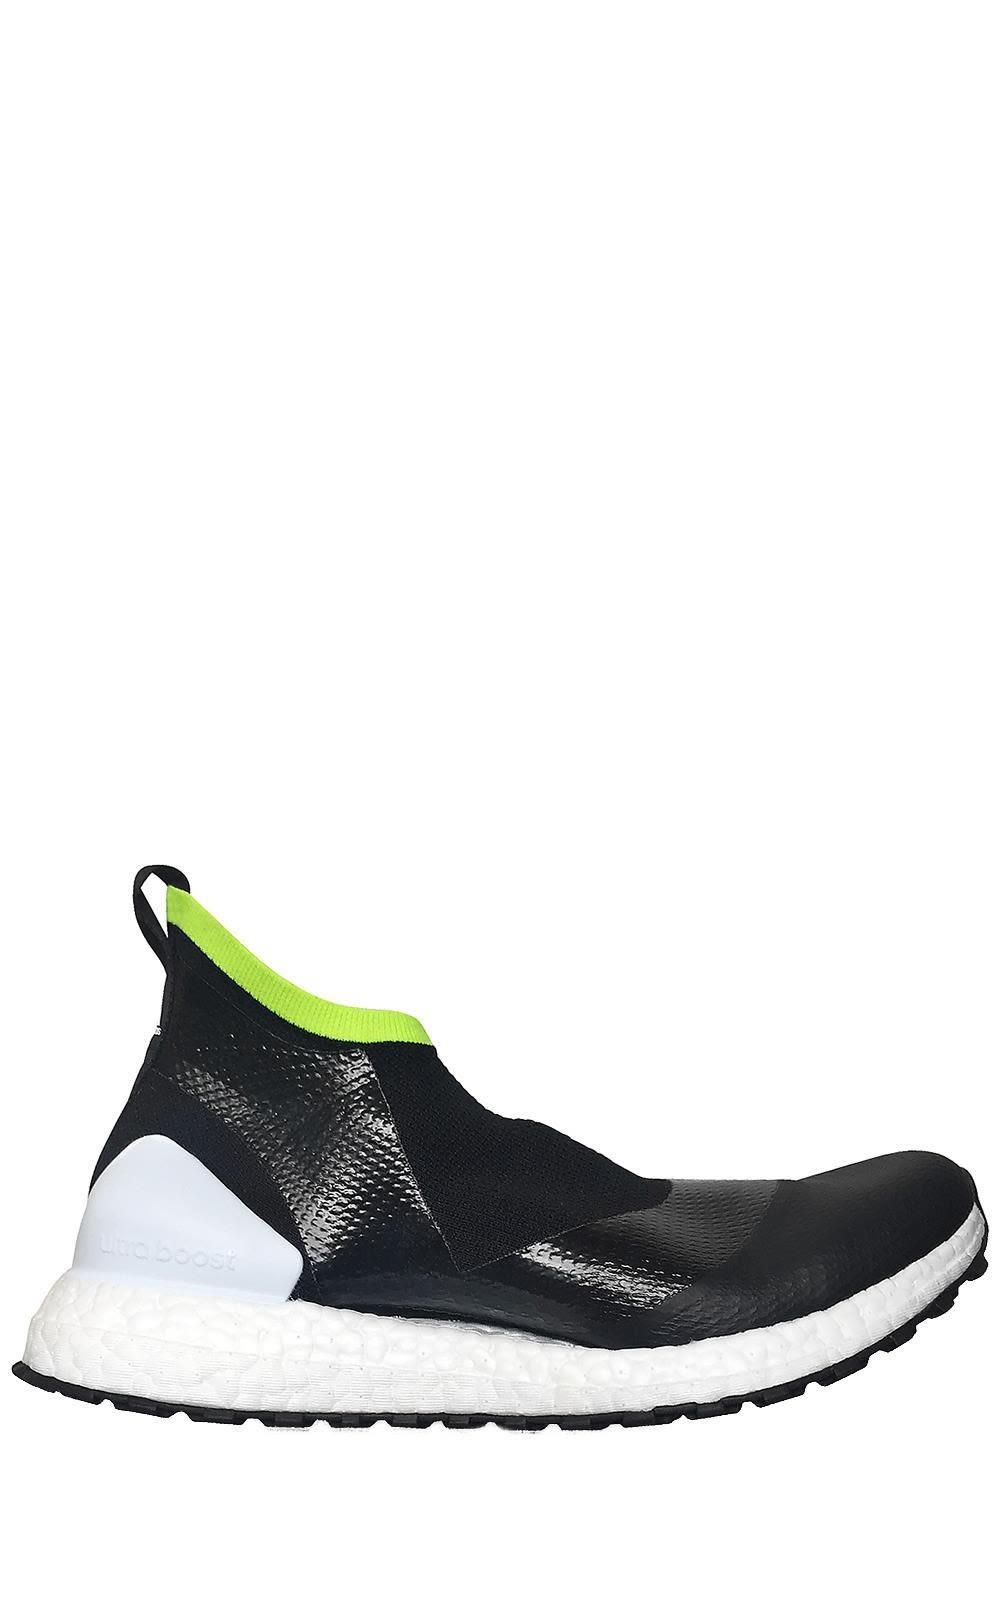 best service ae433 b0542 Adidas By Stella Mccartney Adidas X Stella Mccartney Ultraboost All Terrain  Primeknit Trainers In Black